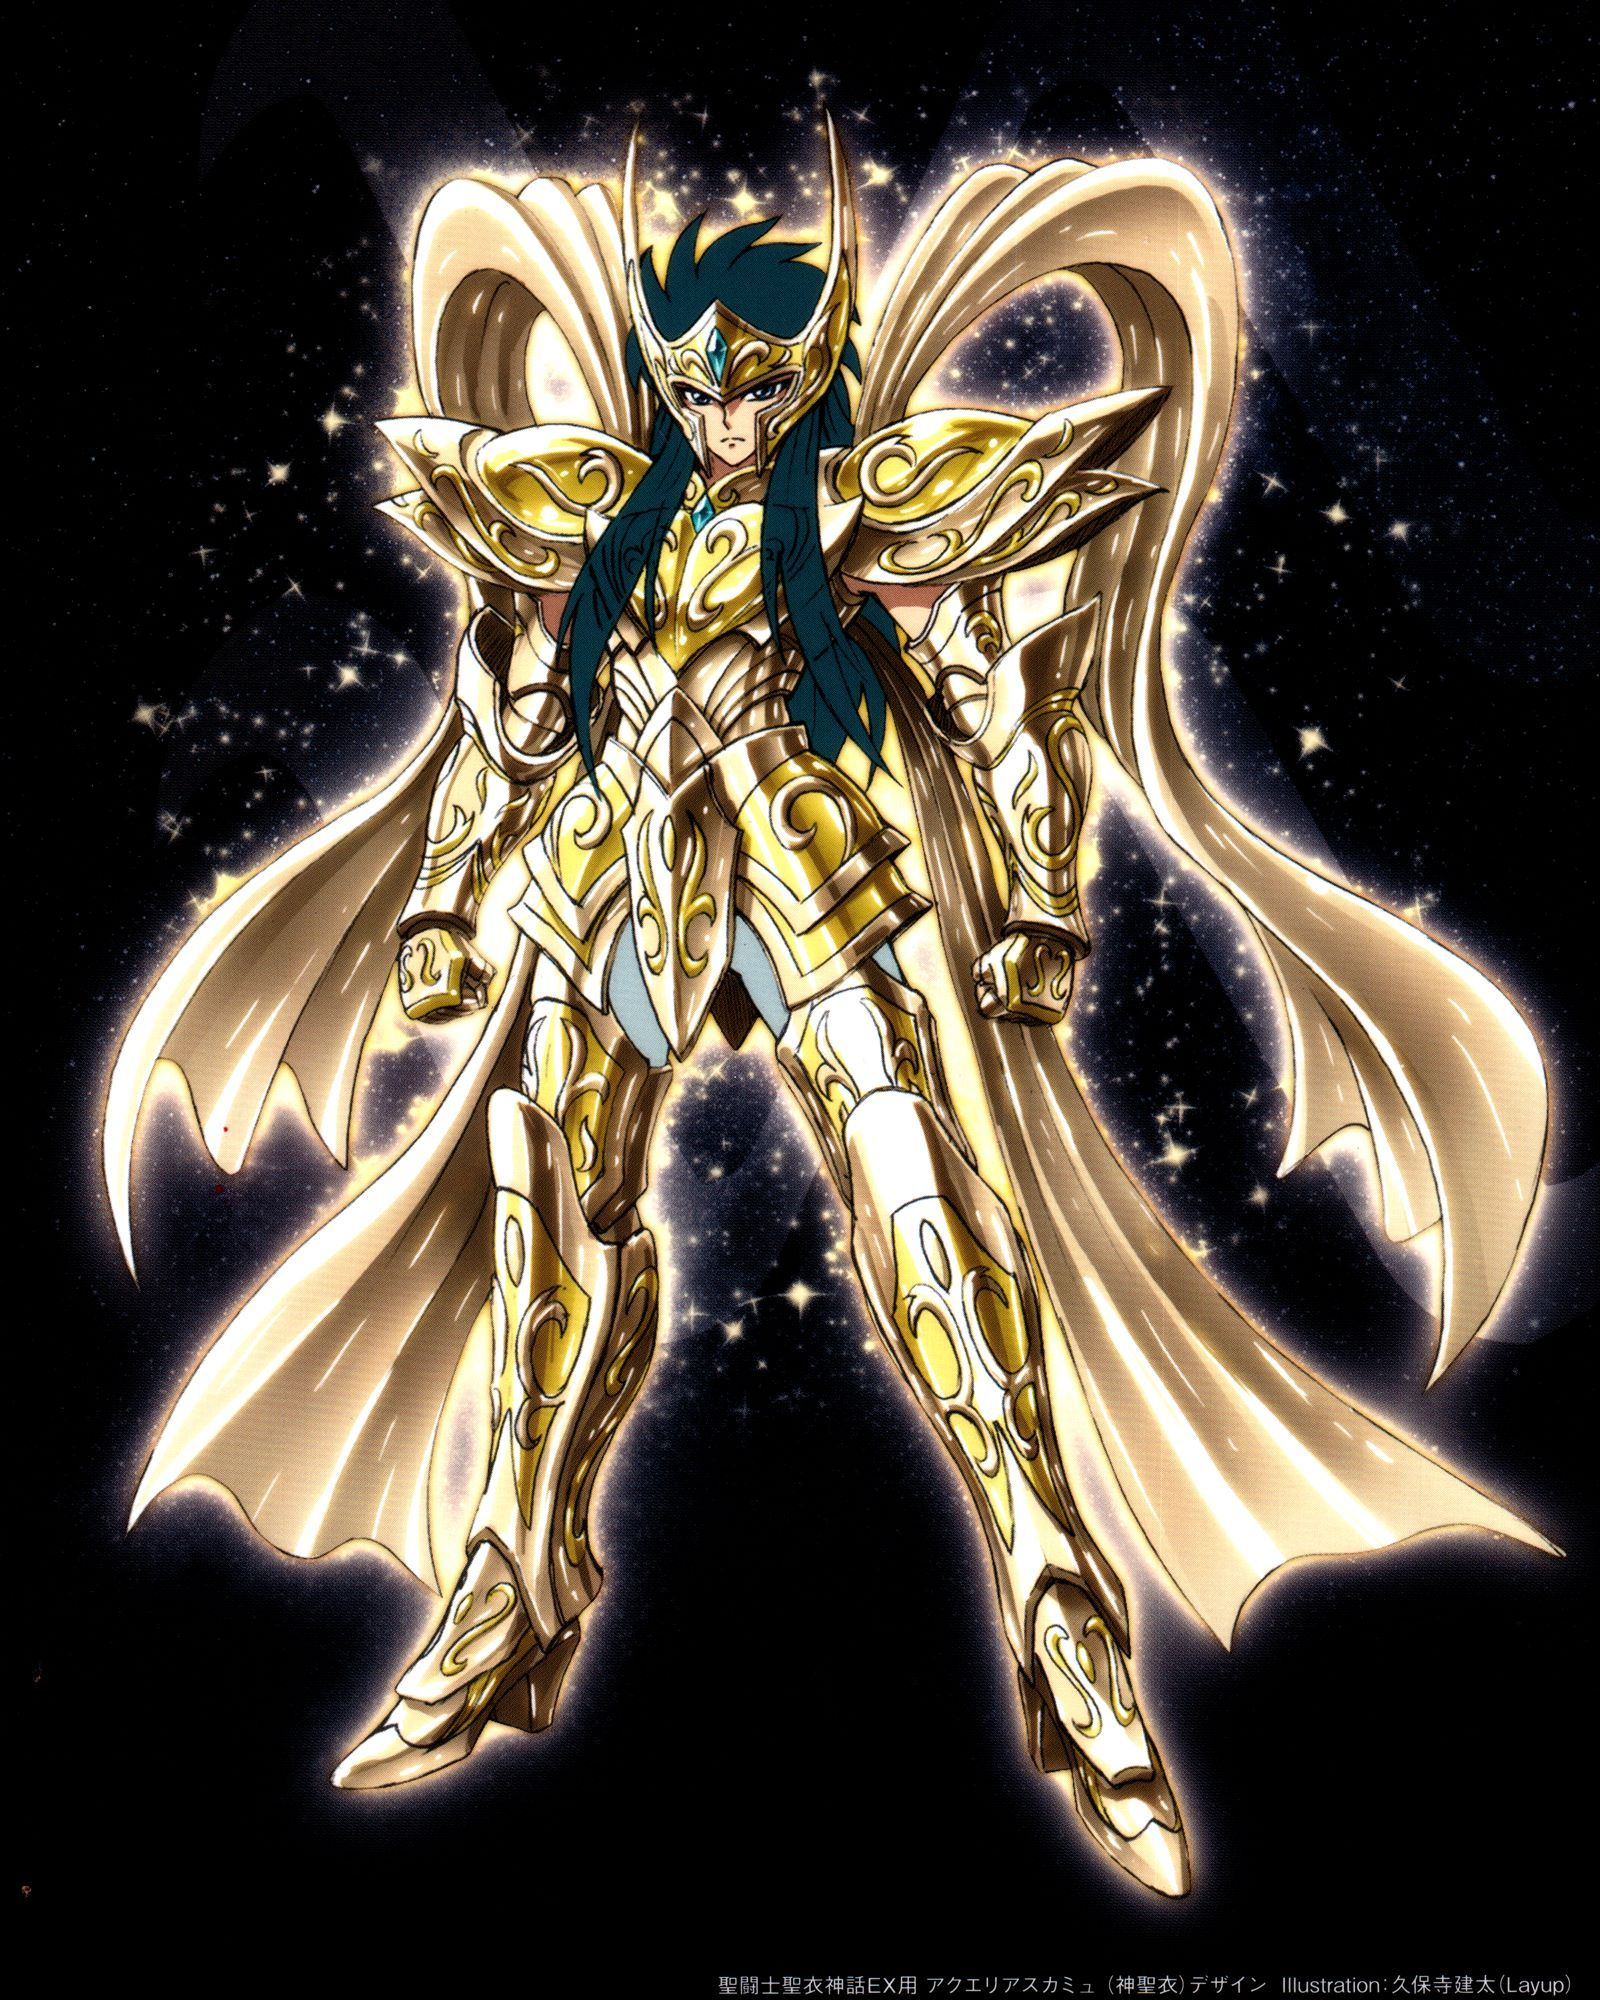 Saint Seiya Soul Of Gold : saint, seiya, Saint, Seiya, Gold,, Camus,, Aquarius., Kenta, Kubodera, Camus, Aquario,, Seiya,